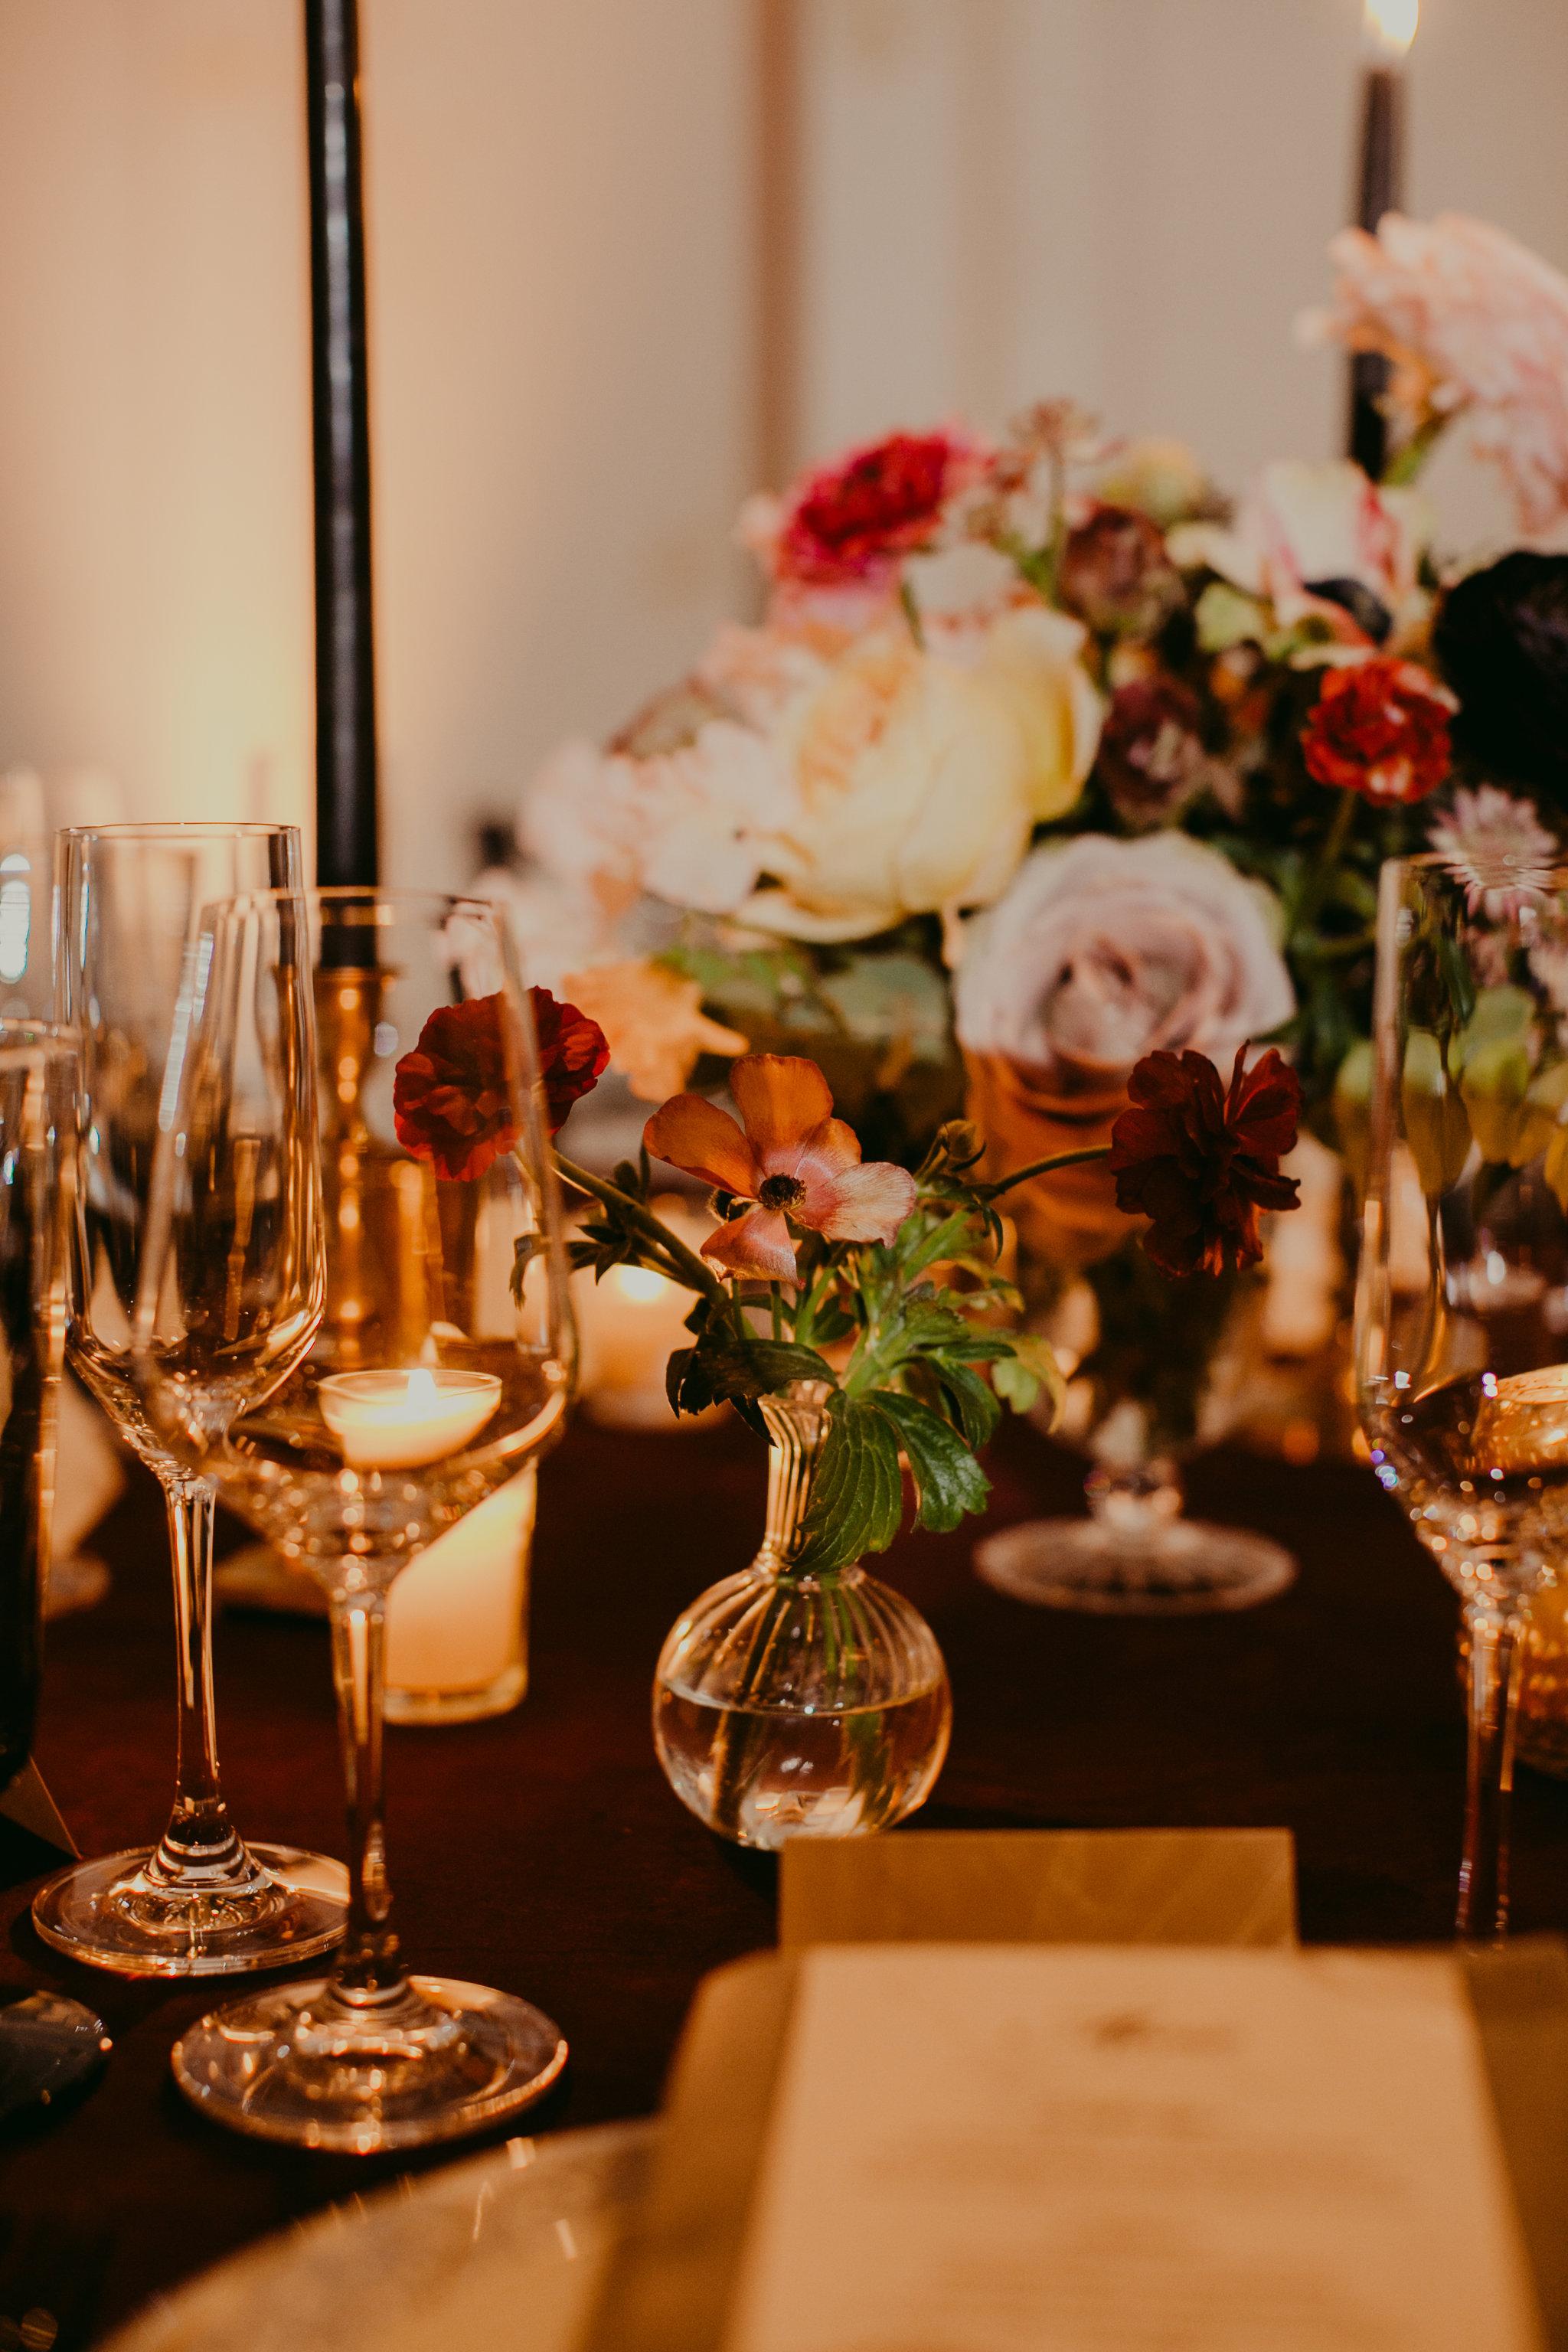 Williamsburg_Hotel_Wedding_Photographer_Chellise_Michael_Photography-258.jpg